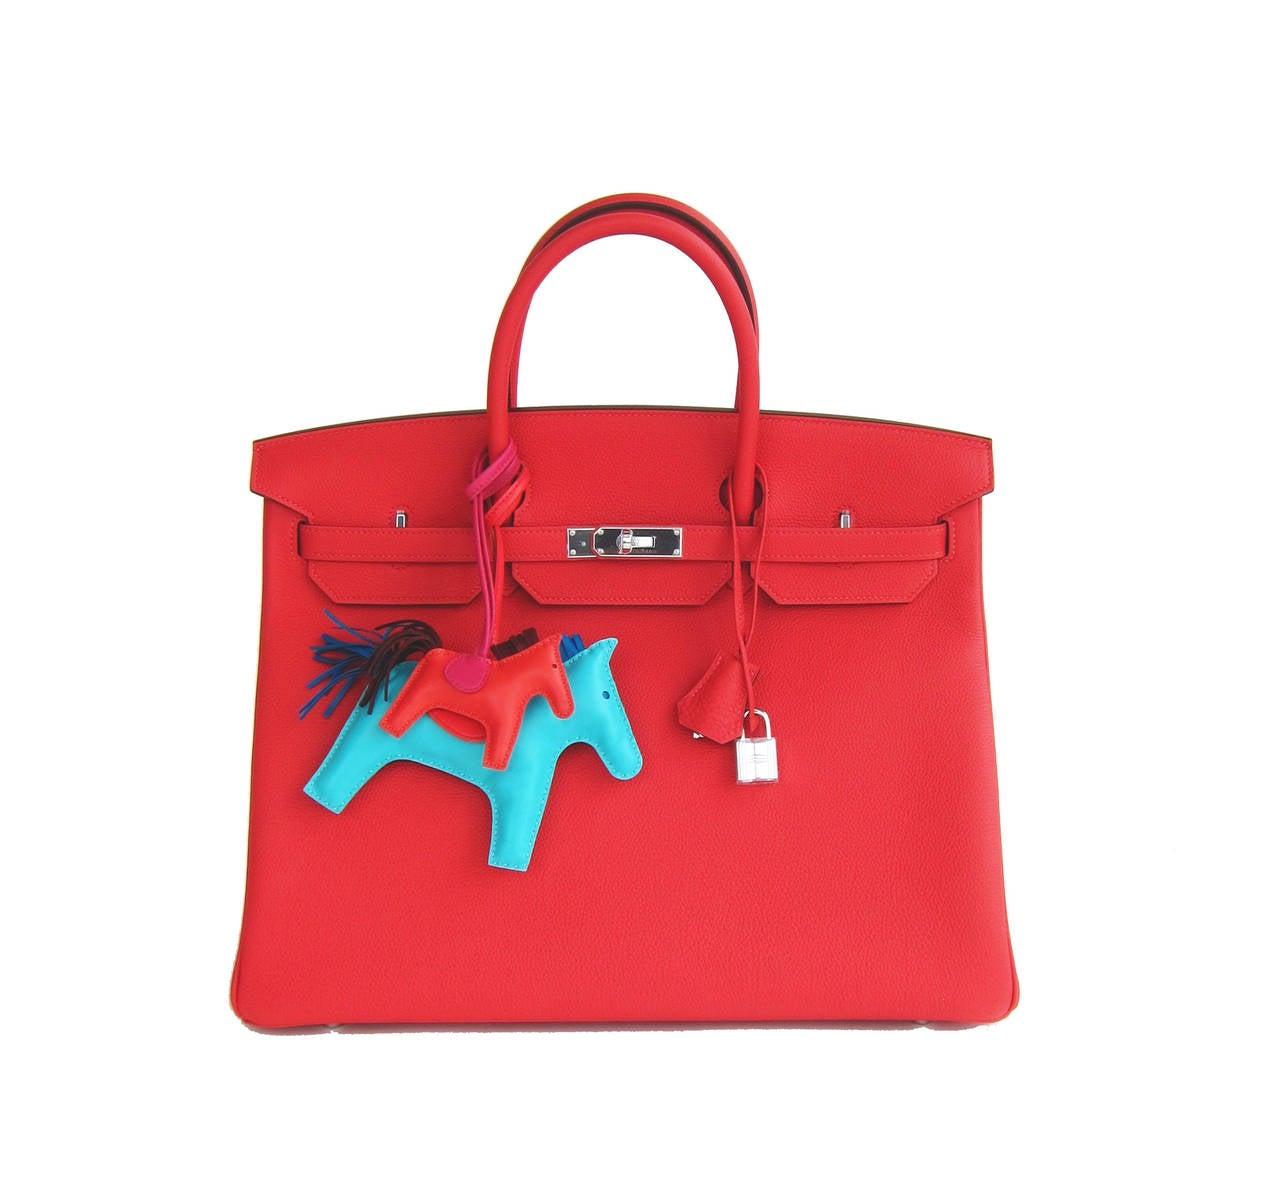 Hermes Rouge Pivoine 40cm Togo Birkin Bag Palladium Luscious For Sale 6